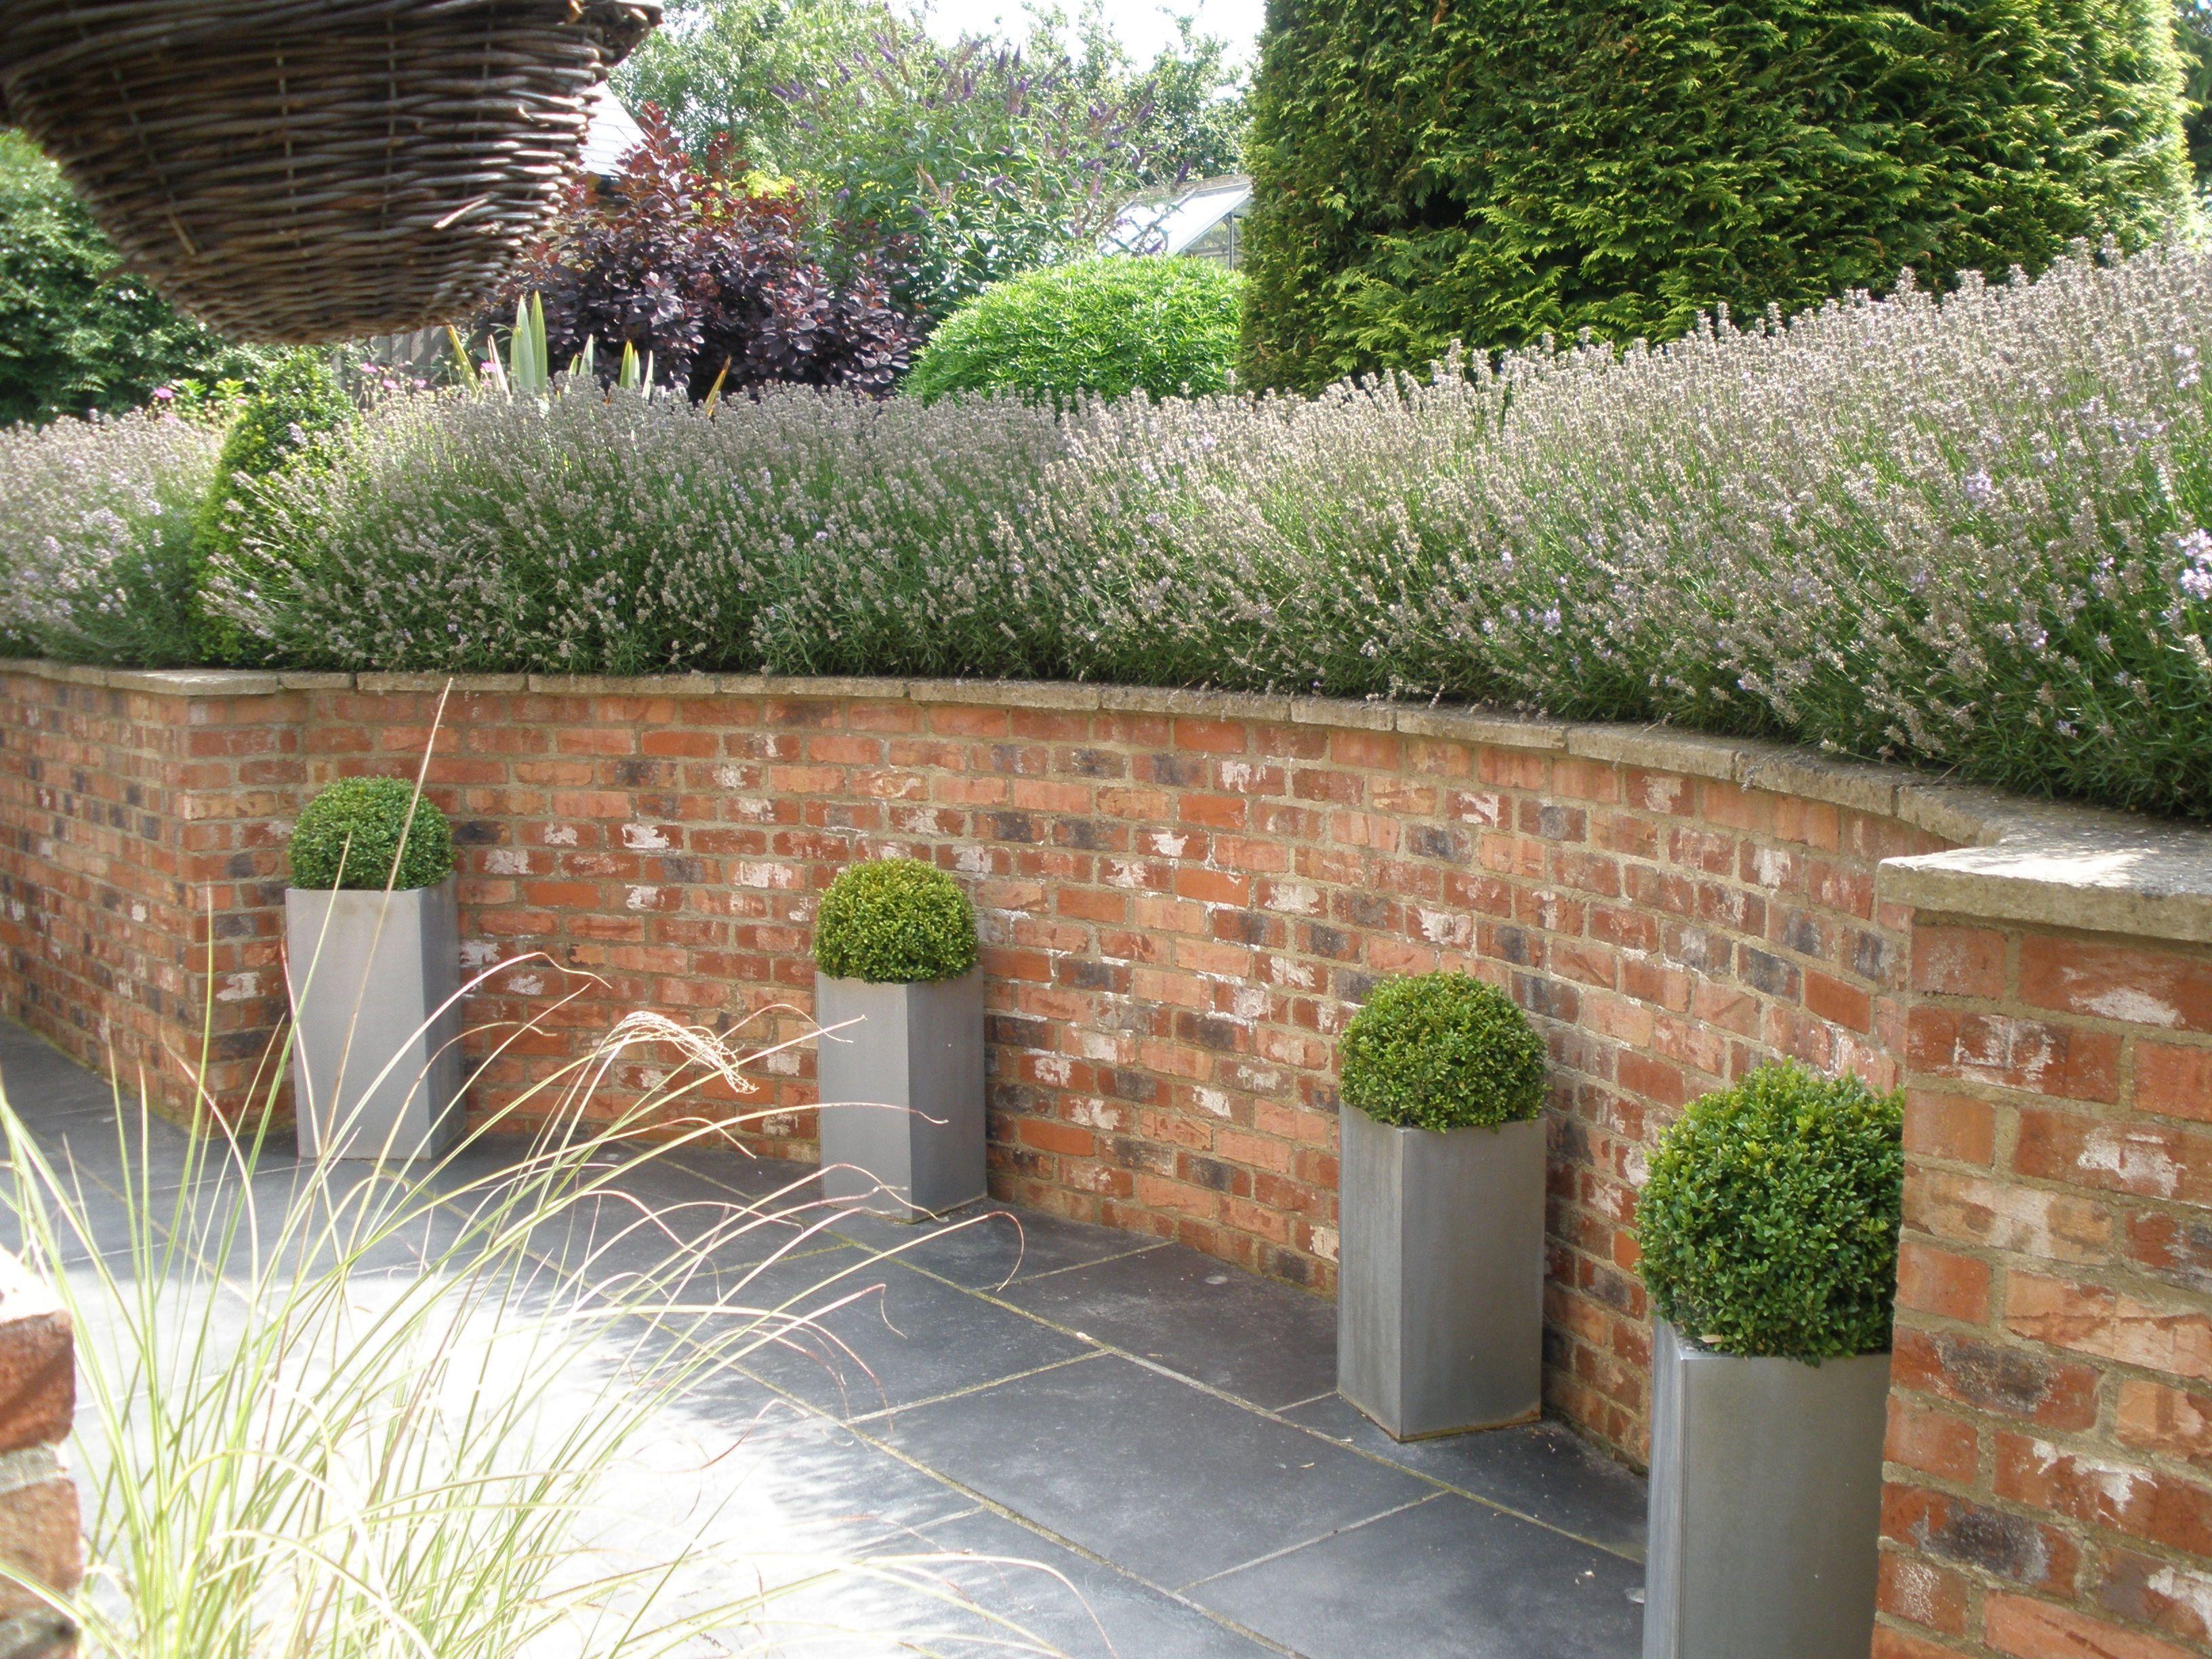 Front Garden Brick Wall Designs Front Garden Wall Ideas Whatiswix Home Garden Set Brick Design Front Wall Design Garden Design